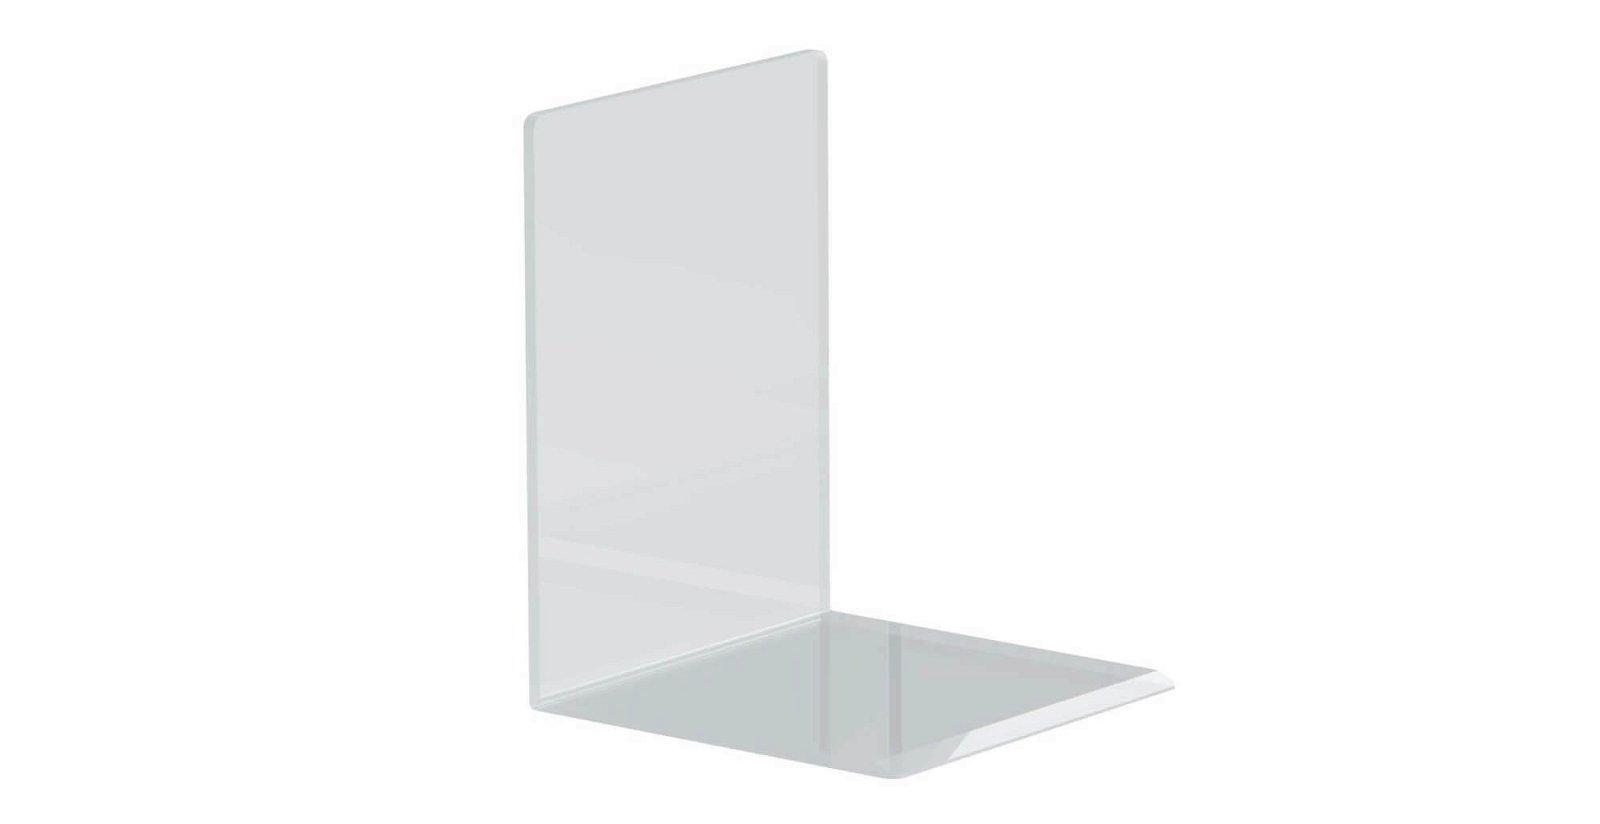 Buchstützen aus Acryl, 10 x 10 x 13 cm, glasklar